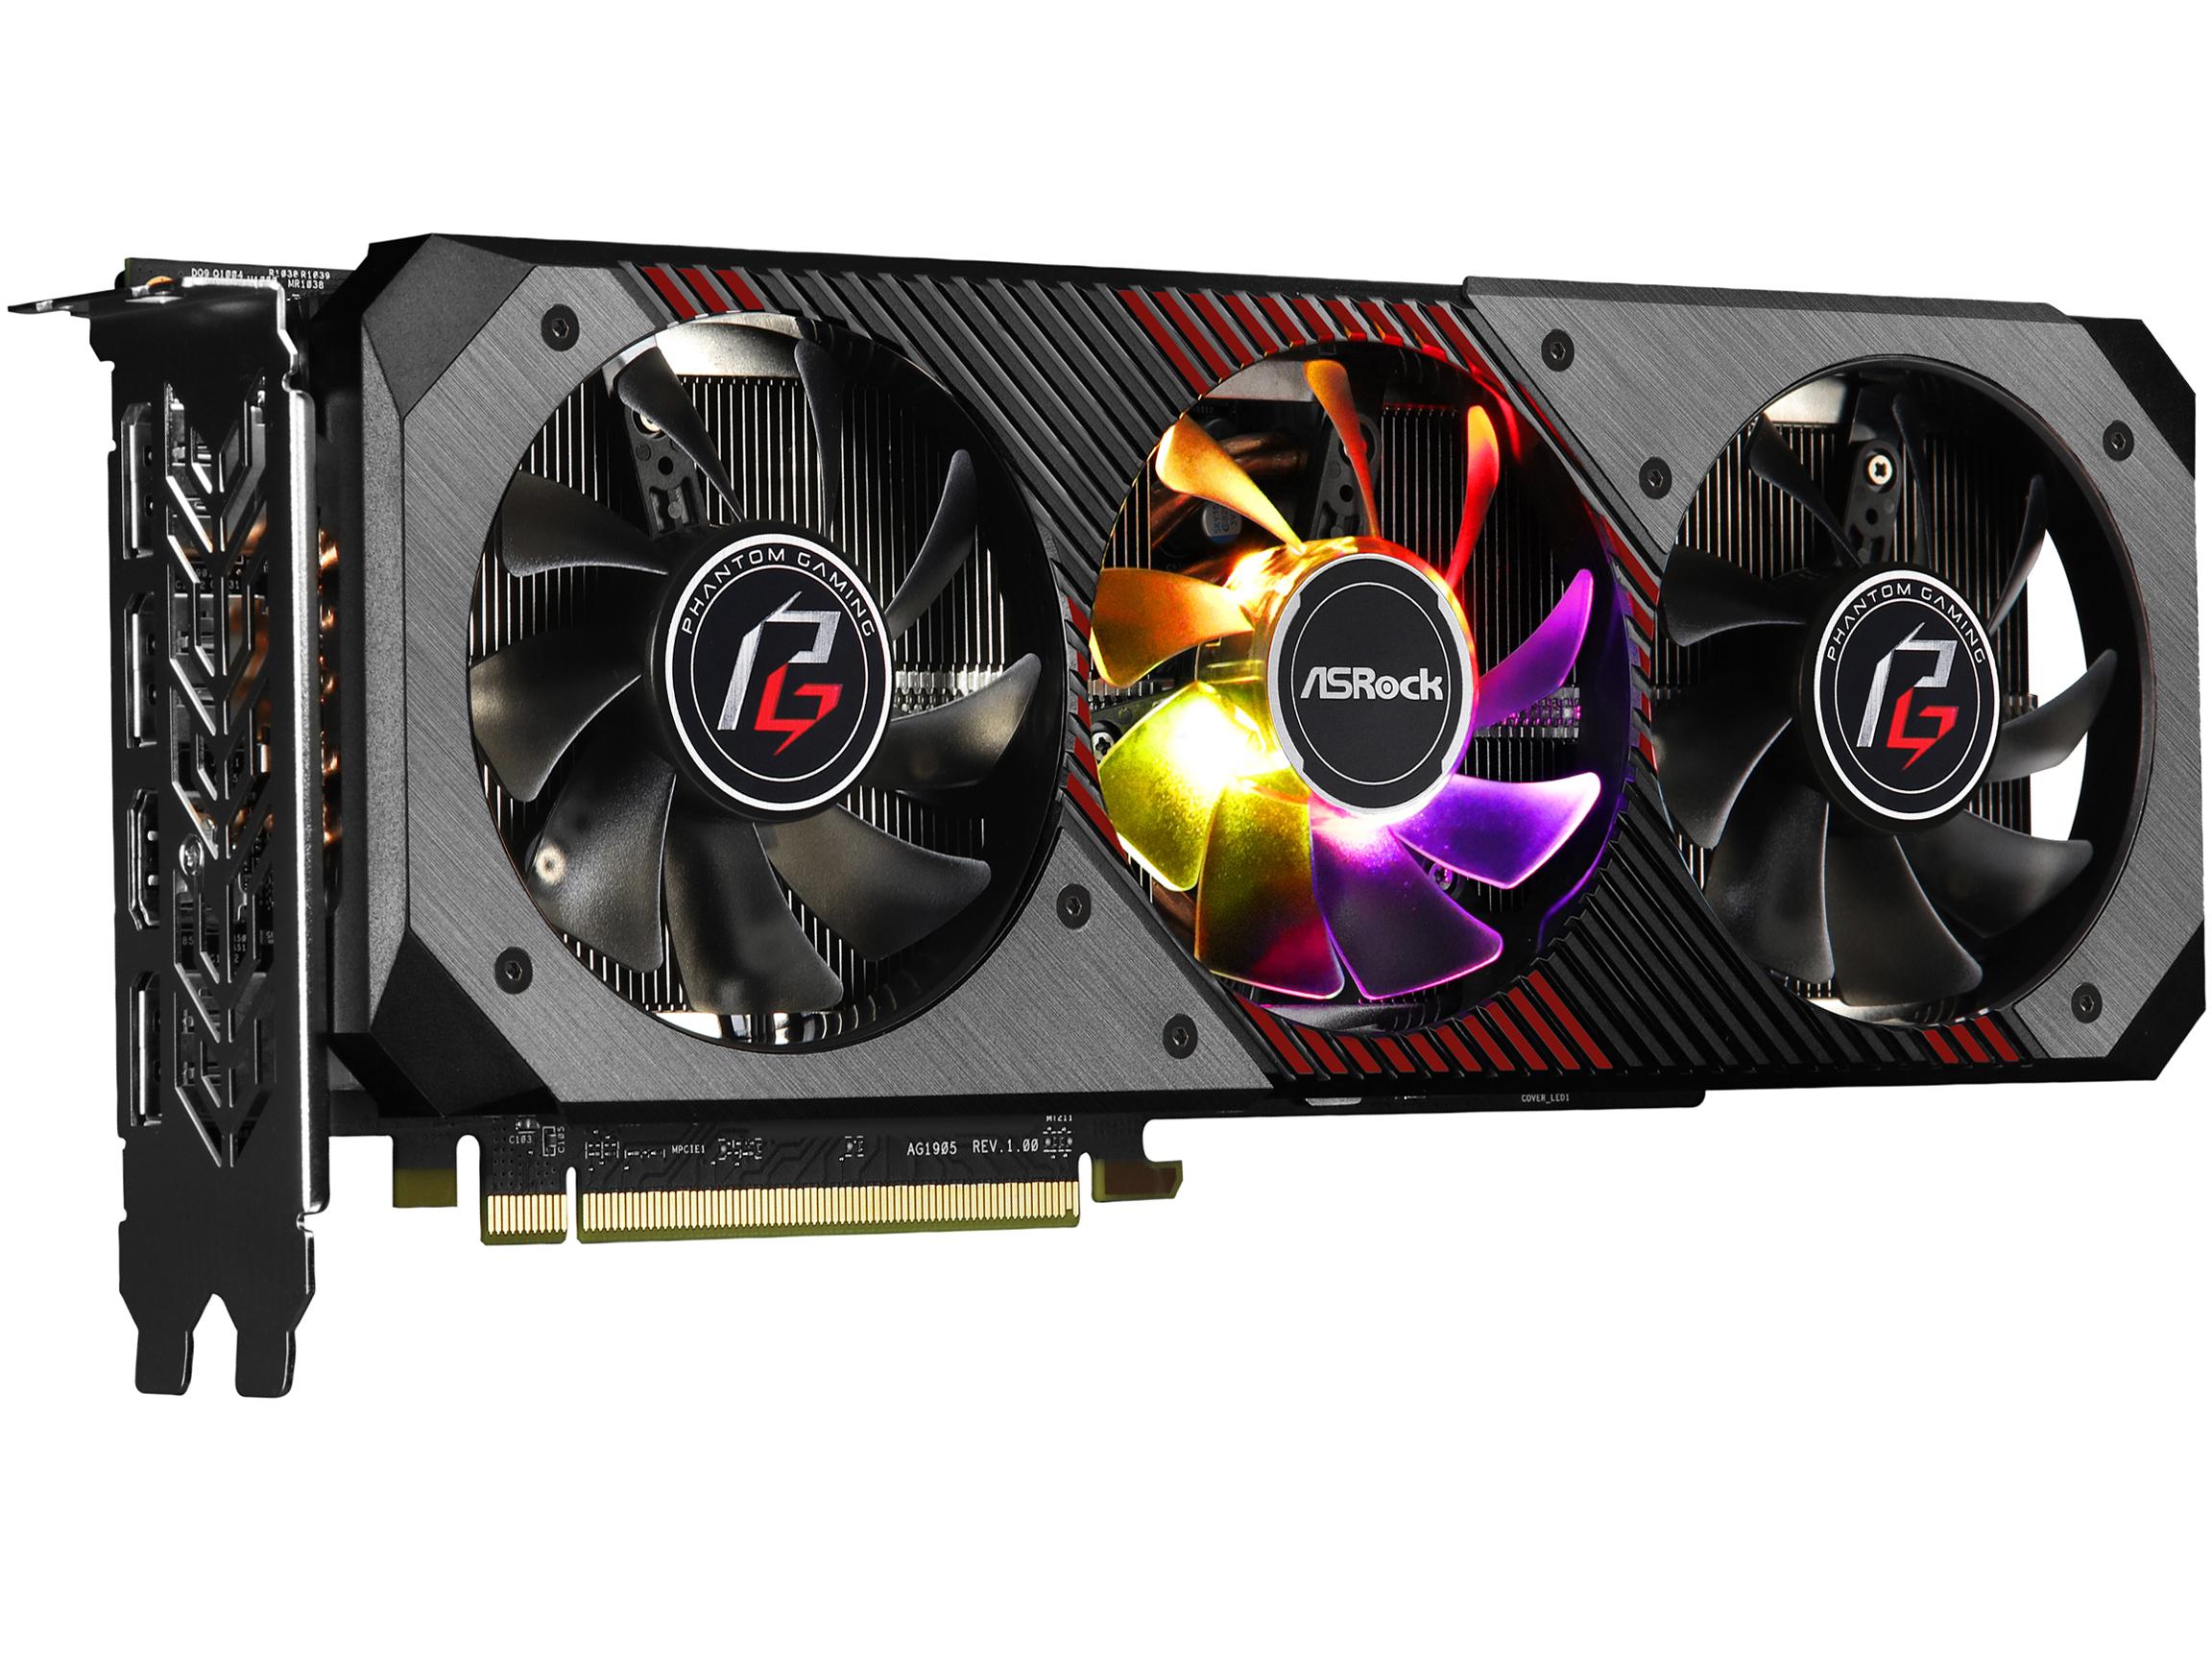 ASRock Phantom Gaming D Radeon RX 5700 XT 8G OC Graphics Card